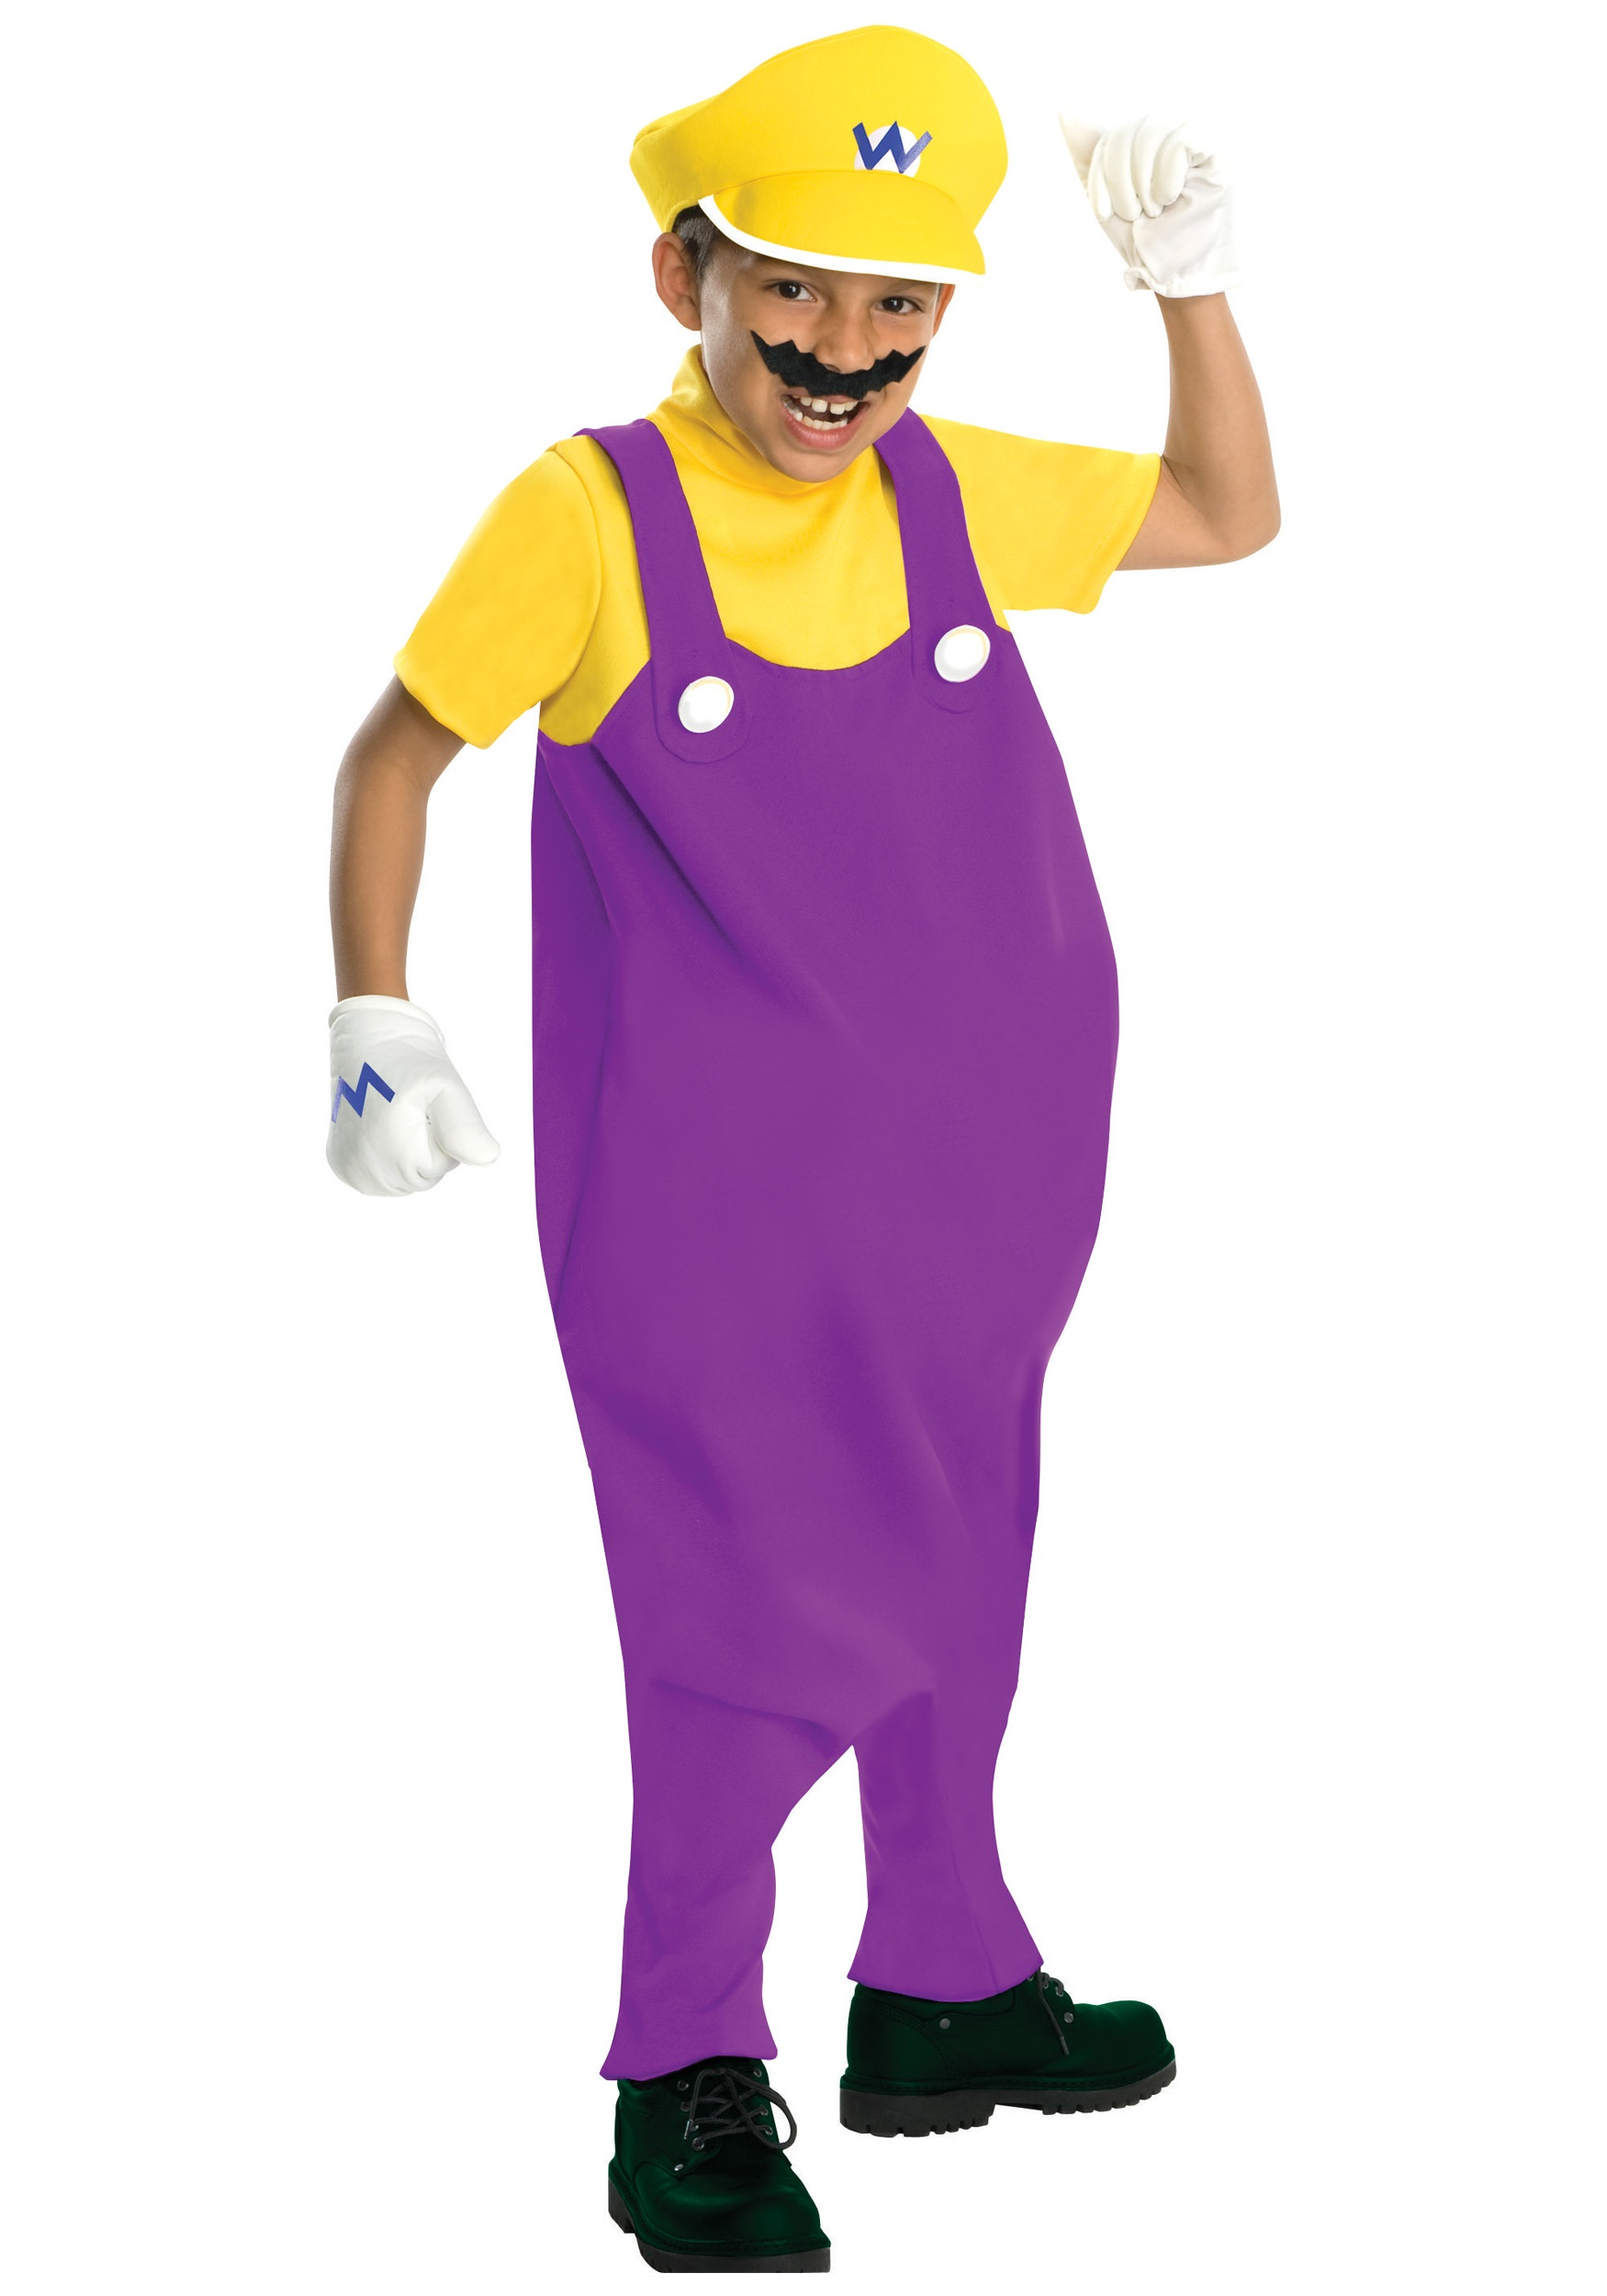 Waluigi Costumes (for Men, Women, Kids) | PartiesCostume.com Wario And Waluigi Costumes